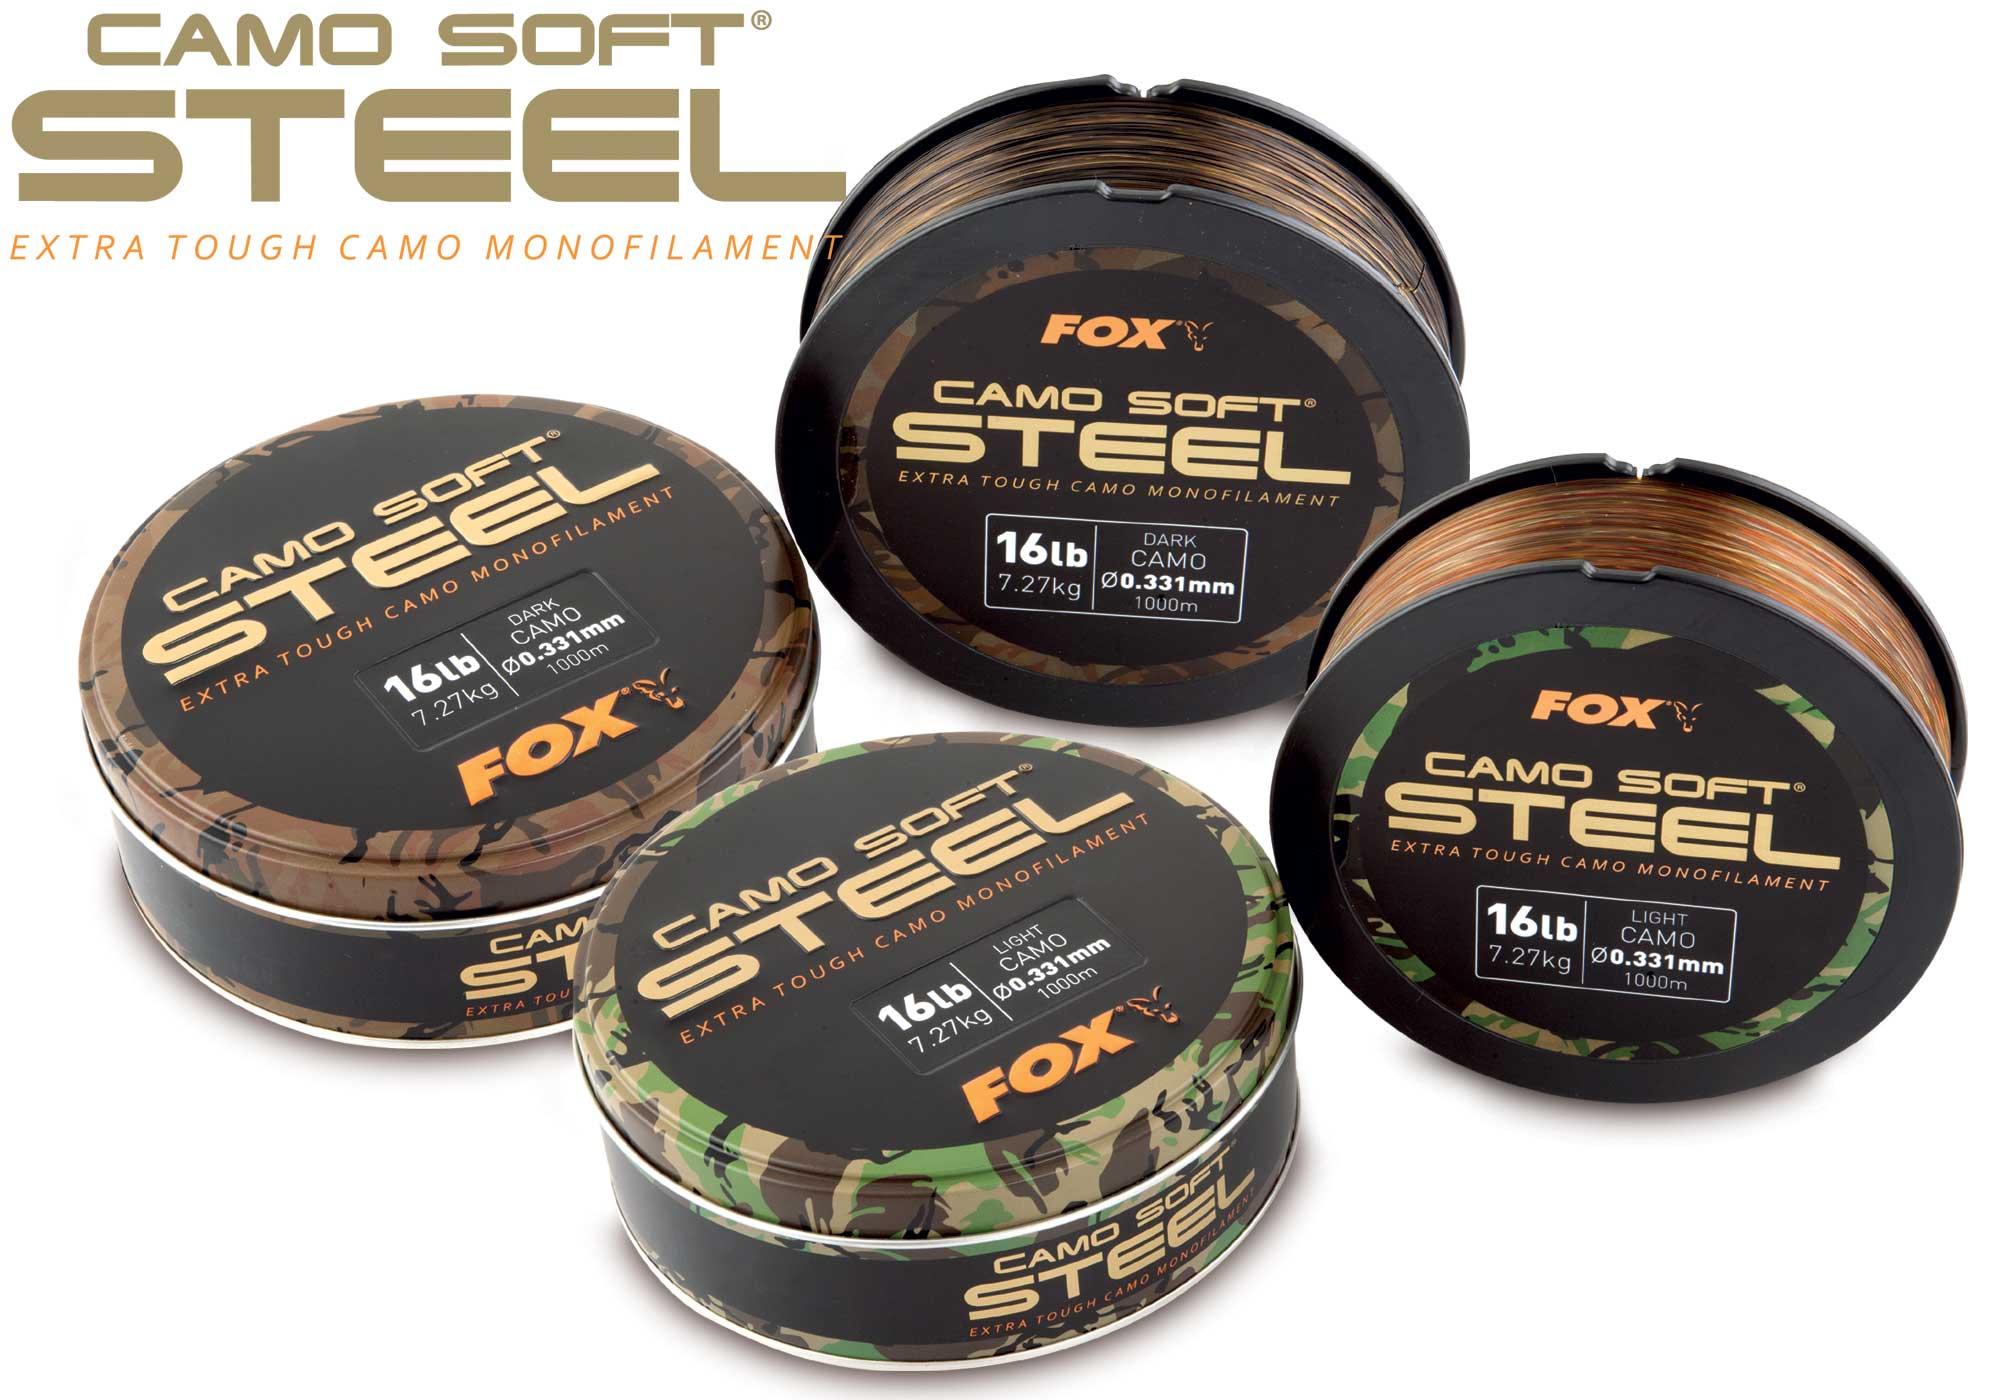 Fox Леска  Camo Soft Steel NEW